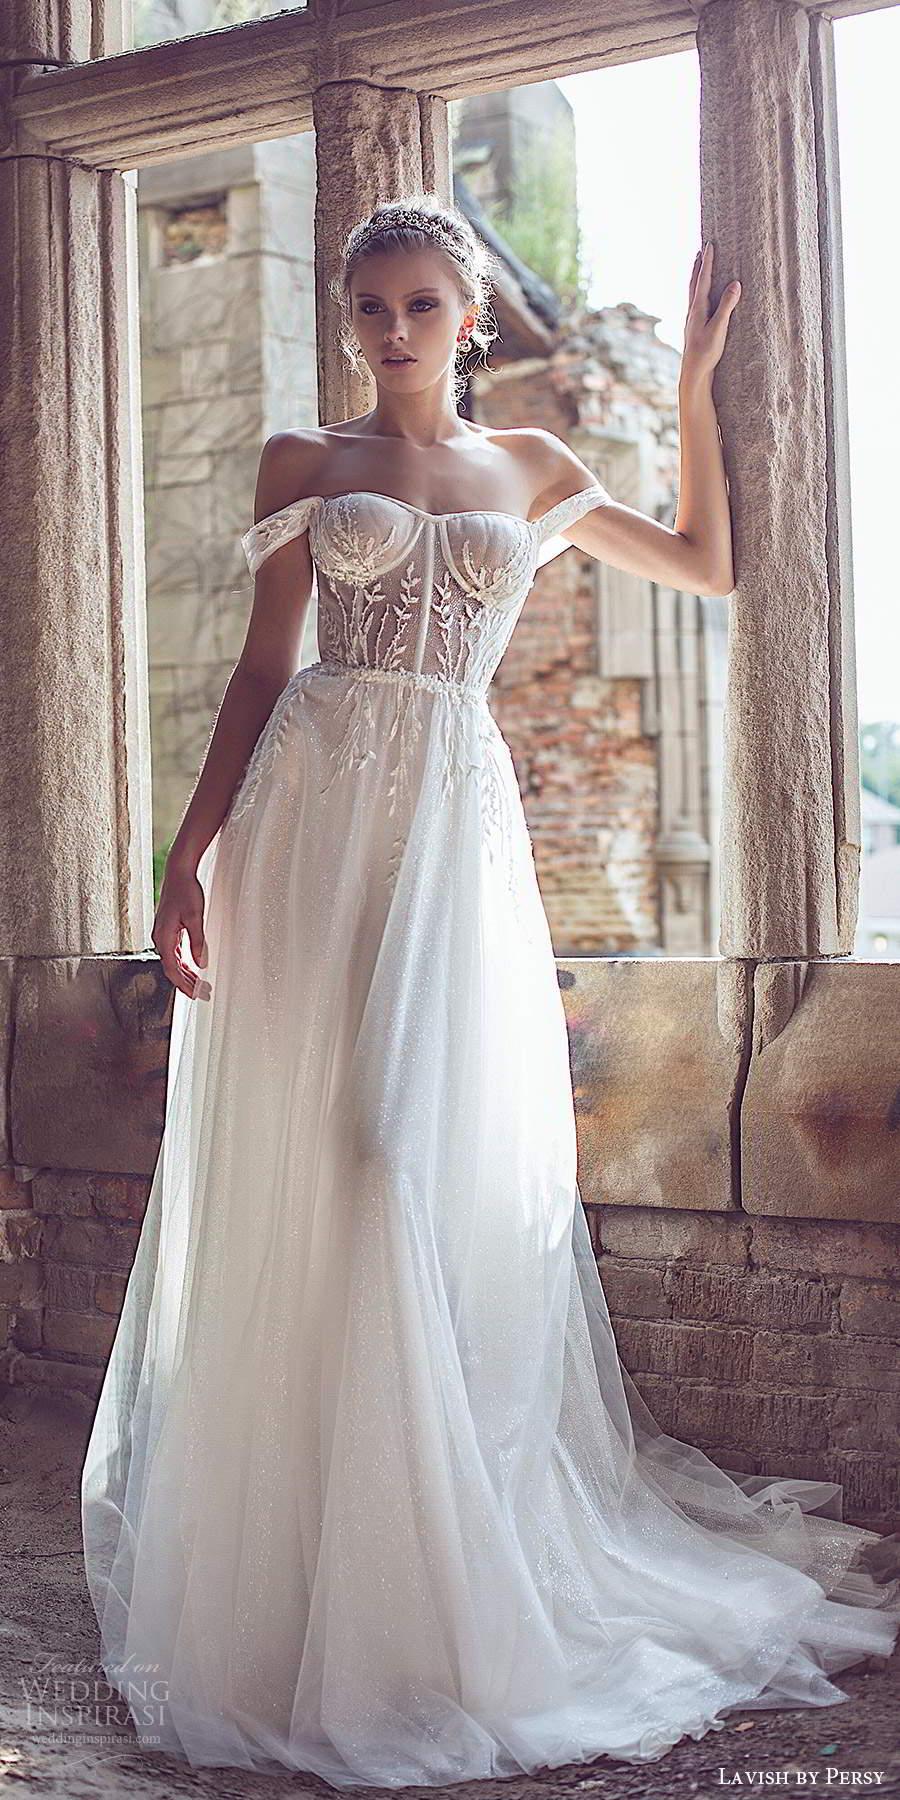 lavish by persy fall 2020 bridal off shoulder straps semi sweetheart neckline sheer embellished bodice a line ball gown wedding dress chapel train (1) mv